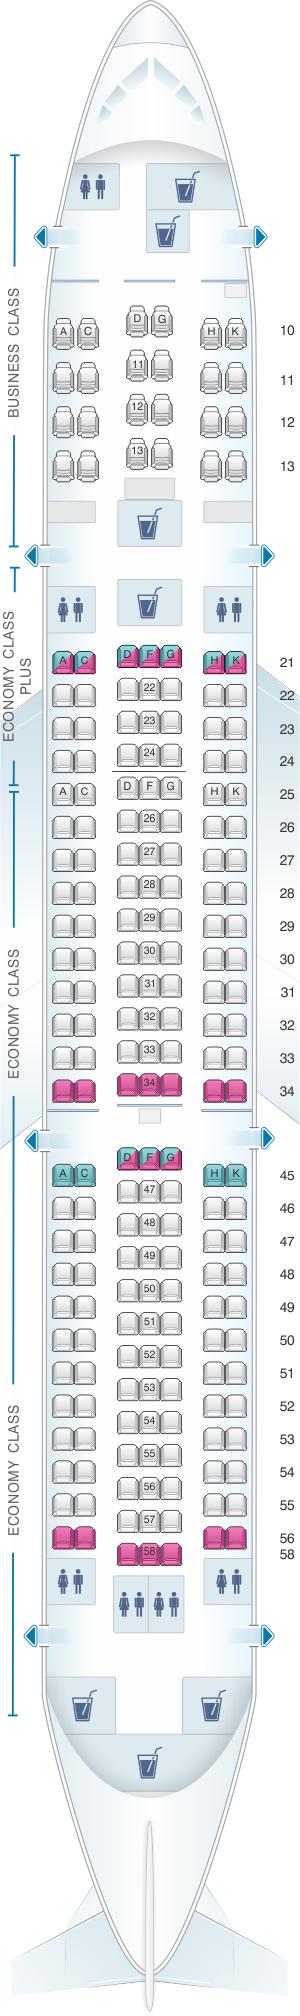 Seat map for El Al Israel Airlines Boeing B767 300ER 209pax